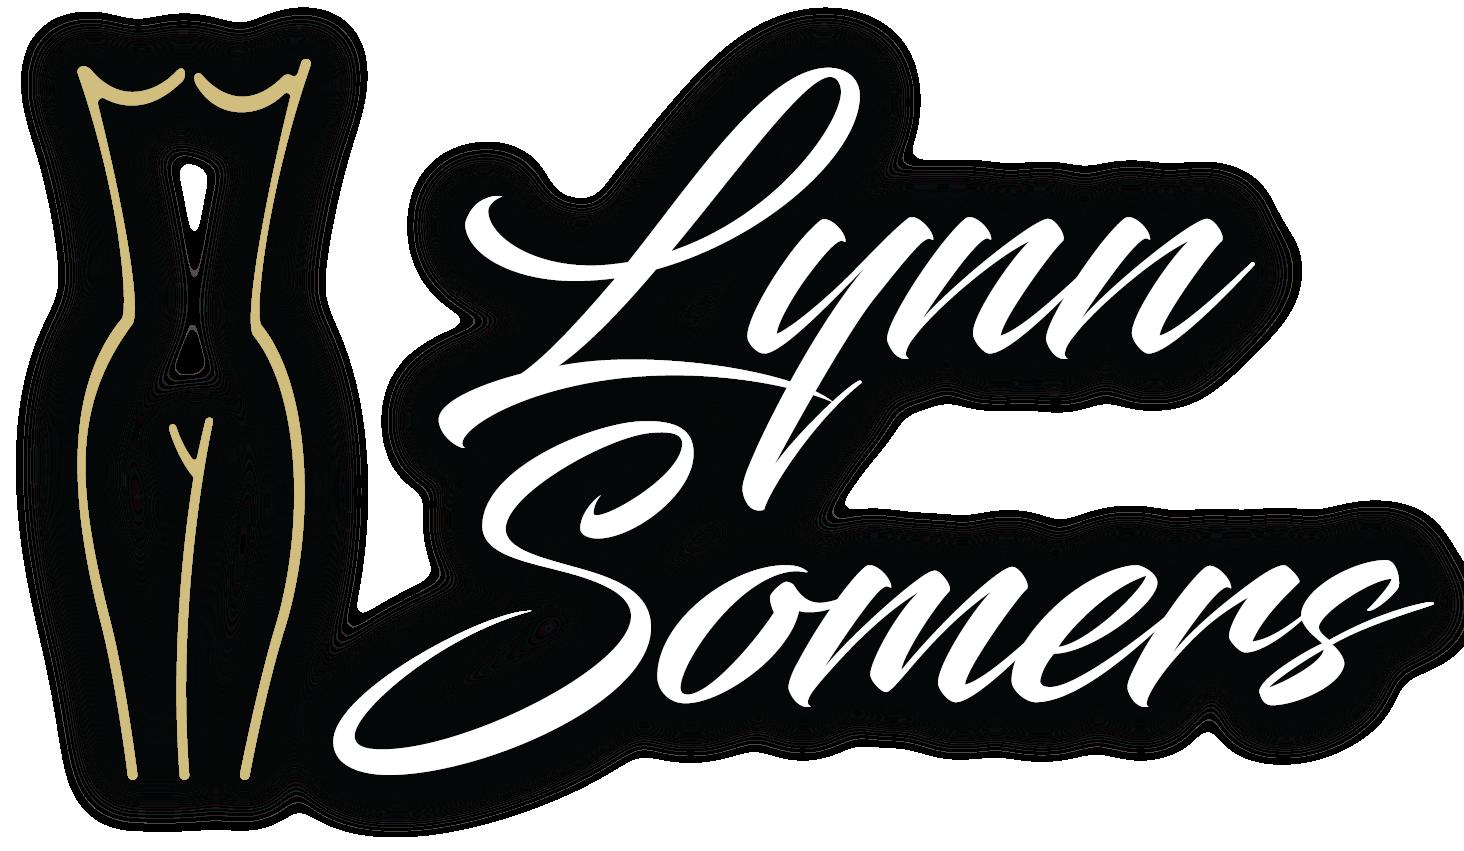 Lynn Somers